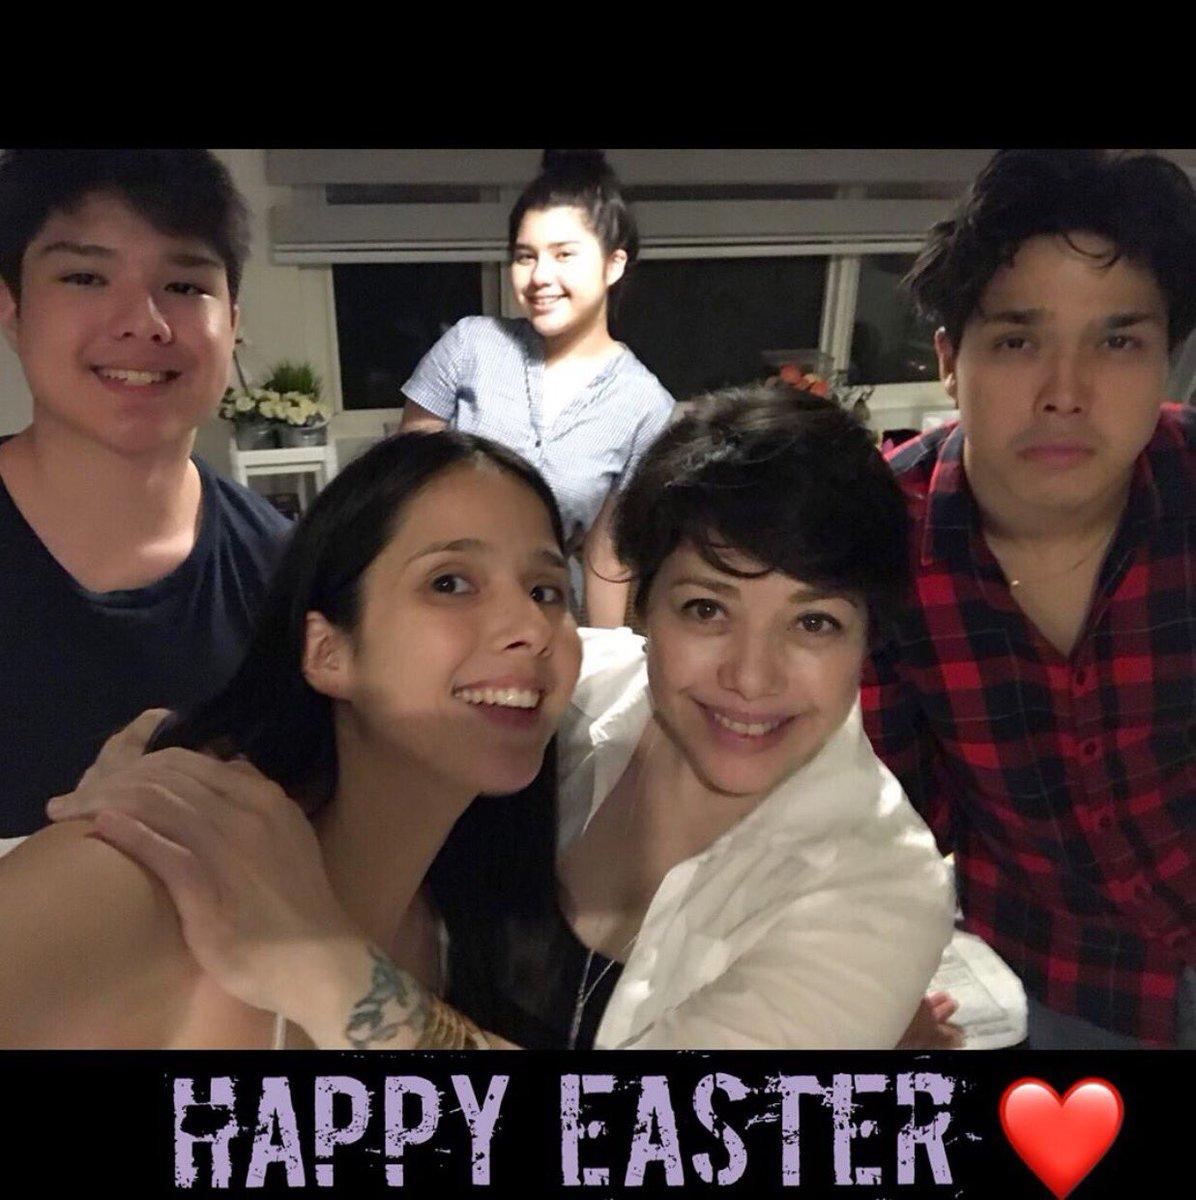 Happy Easter  everyone  From #Magalona family   @LucianoArkin @claramags @maxenemagalona @SuperElmo  © ms. @piamagalonapic.twitter.com/gzXqXDtz8X